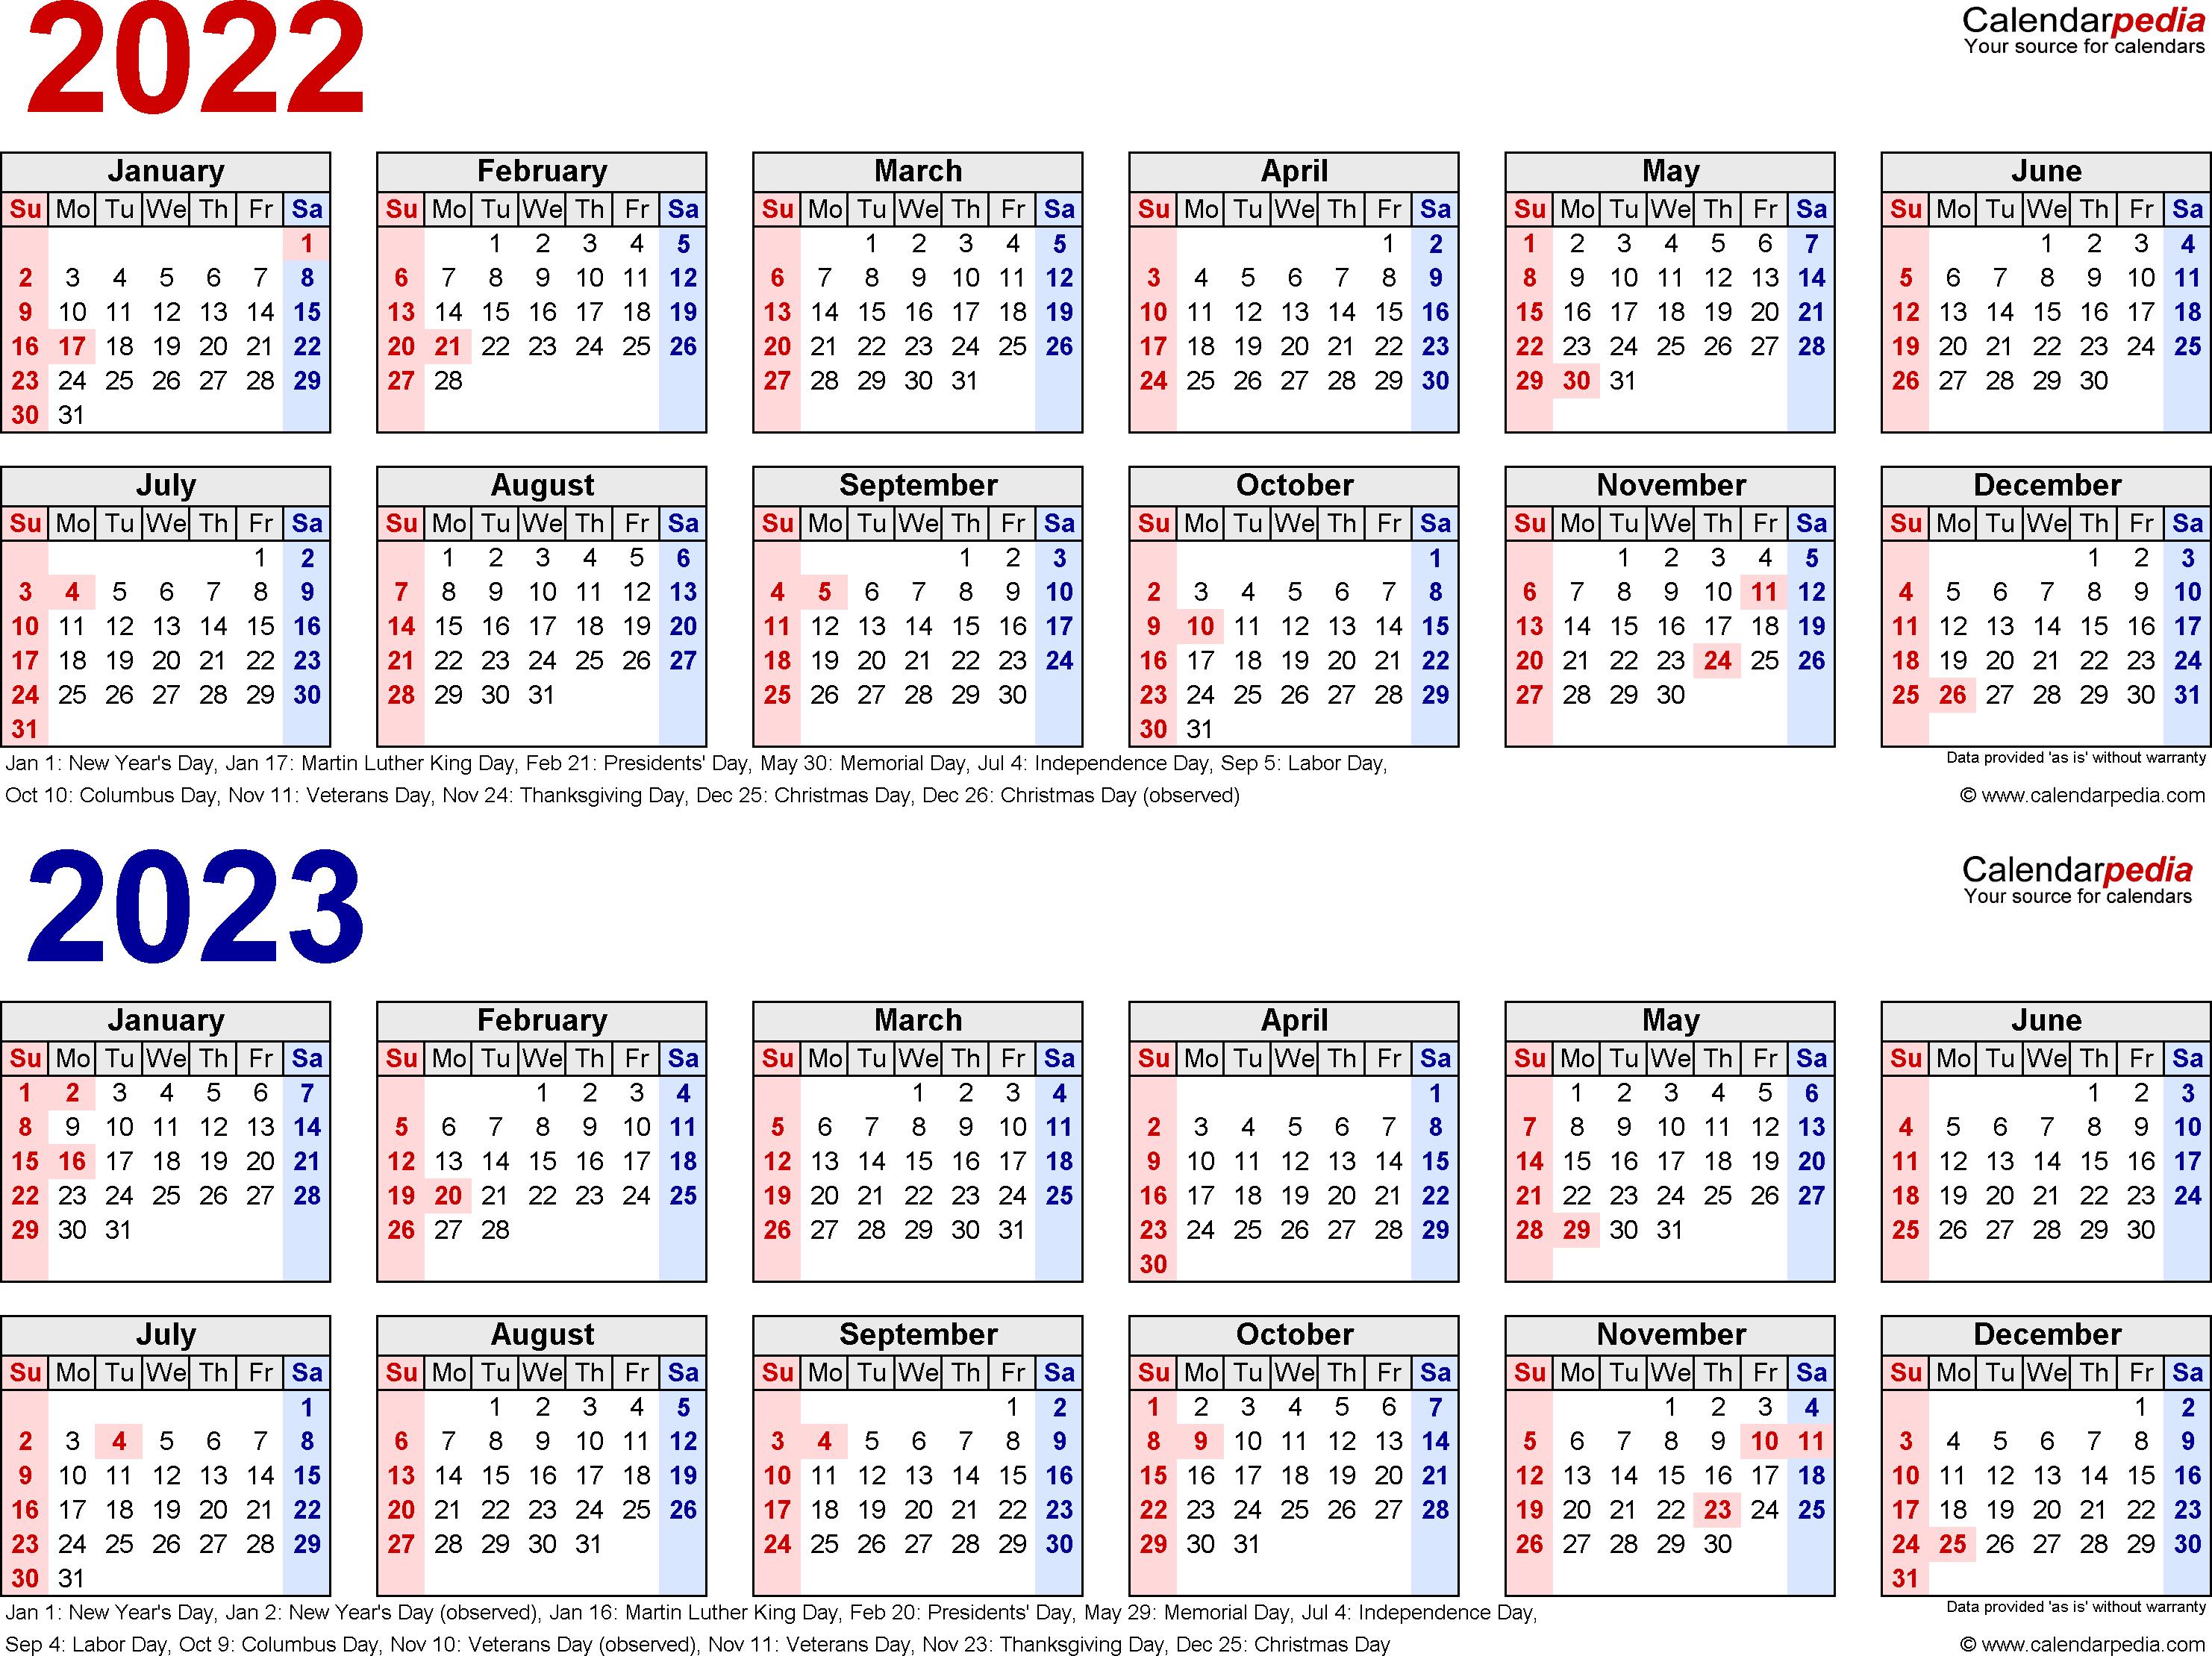 2022-2023 Calendar - Free Printable Two-Year Word Calendars